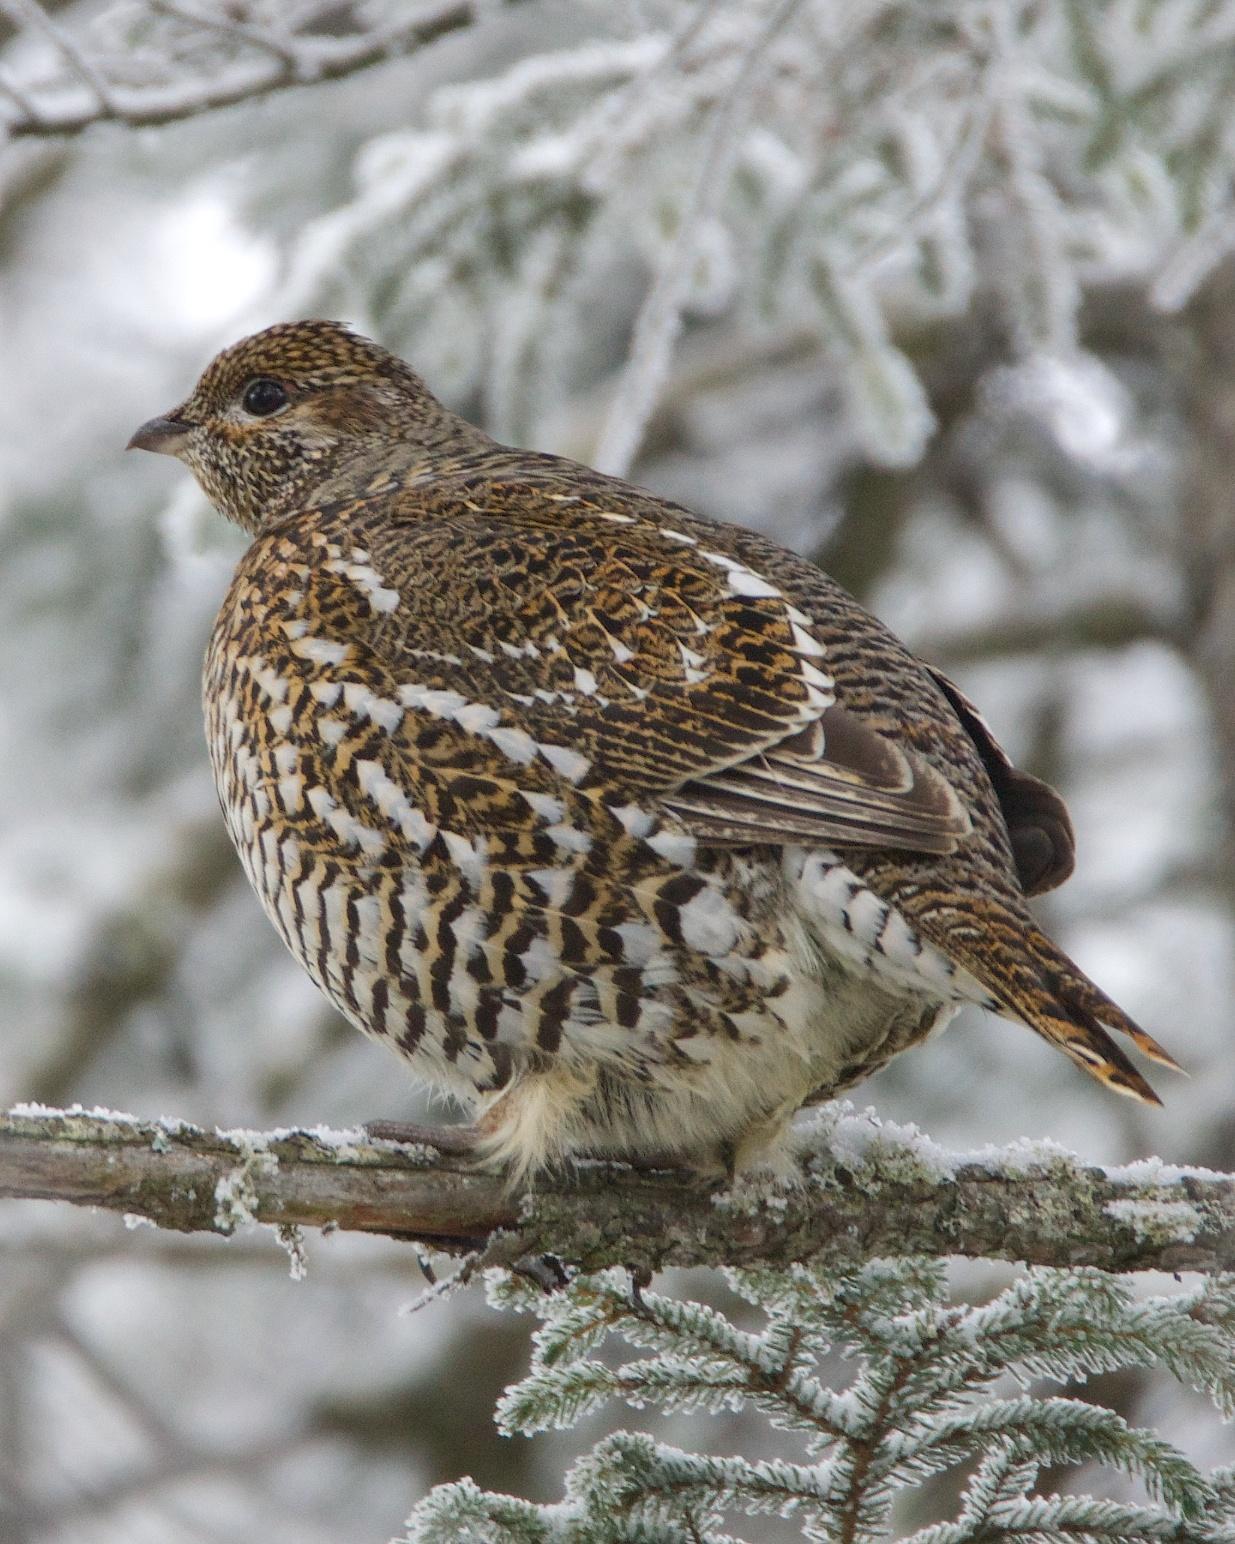 Spruce Grouse Photo by Gerald Hoekstra